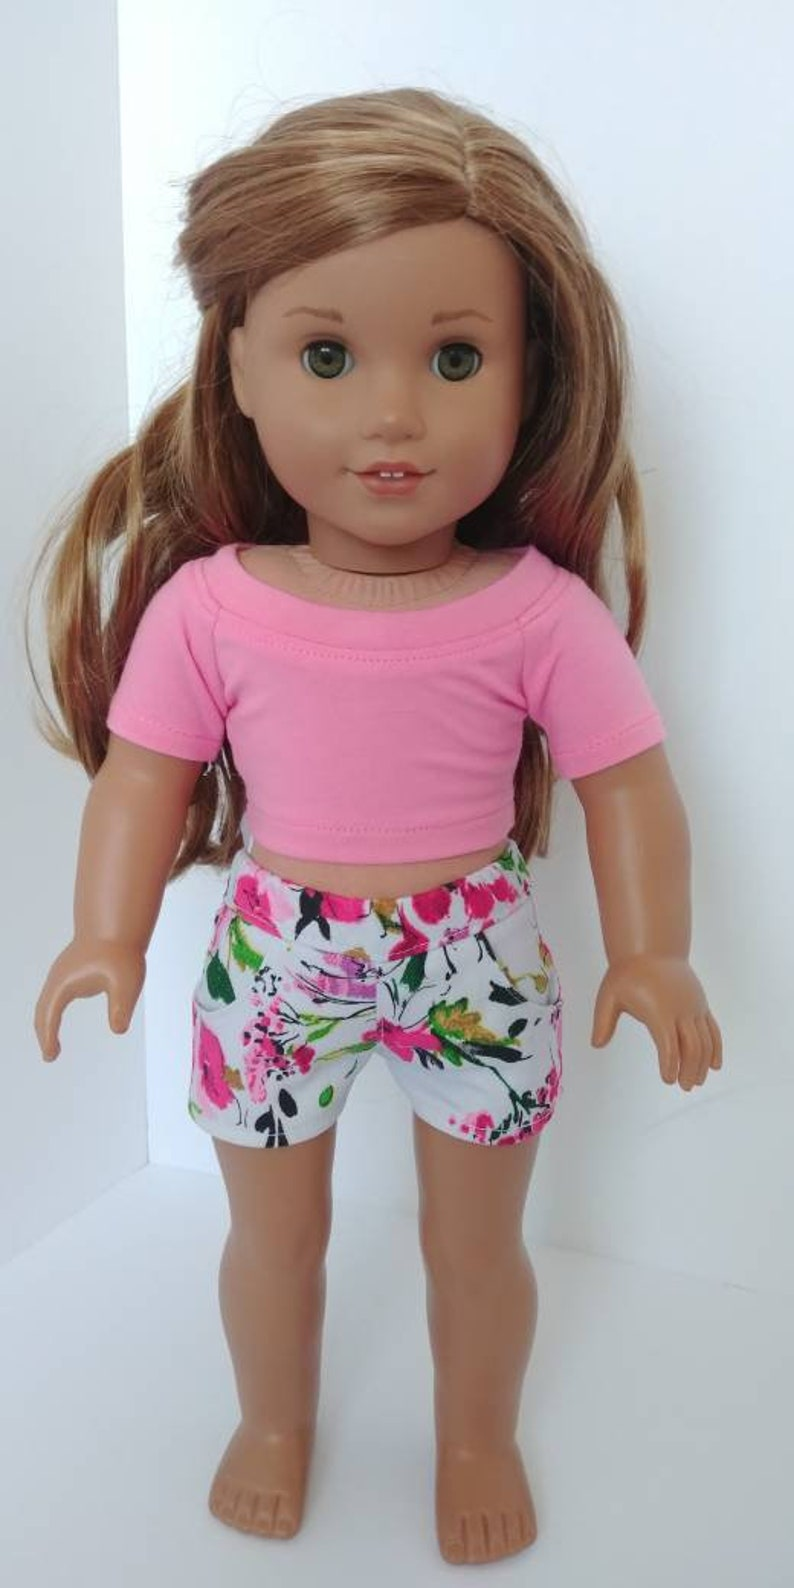 Gray Fushia floral jean shorts Doll Jeans shorts .18 inch doll clothes 18 inch doll clothing American girl